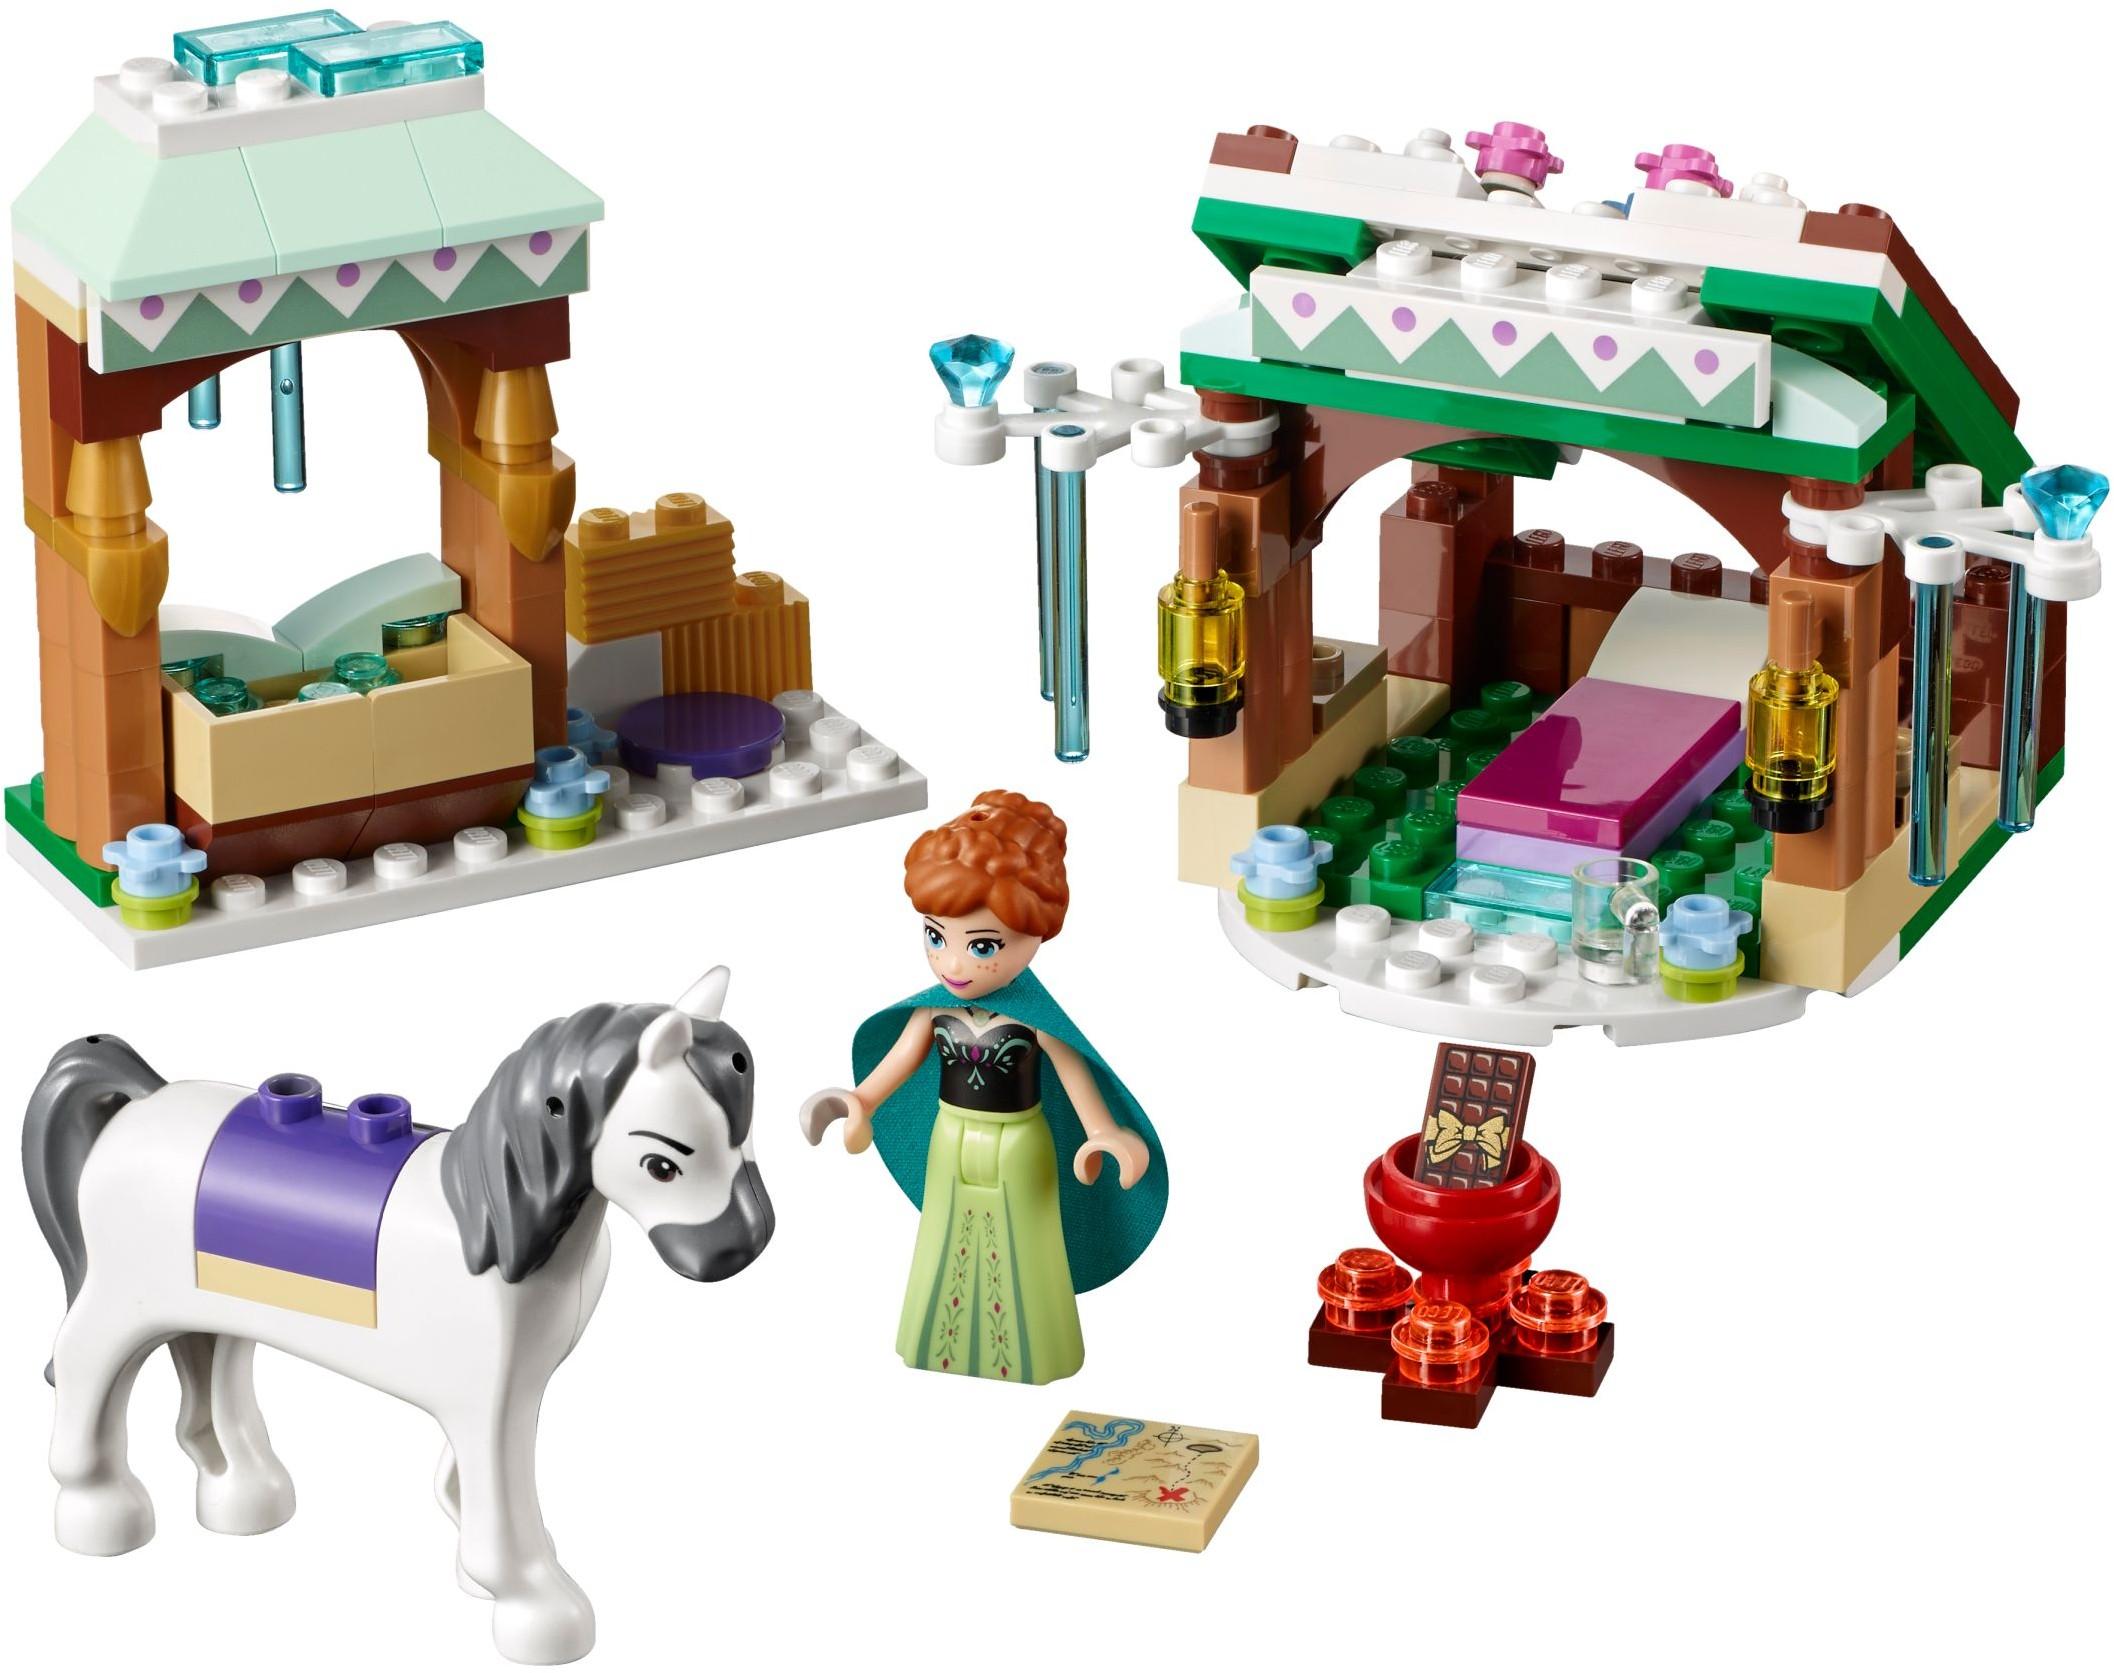 Disney 2017 Sets Revealed Brickset Lego Set Guide And